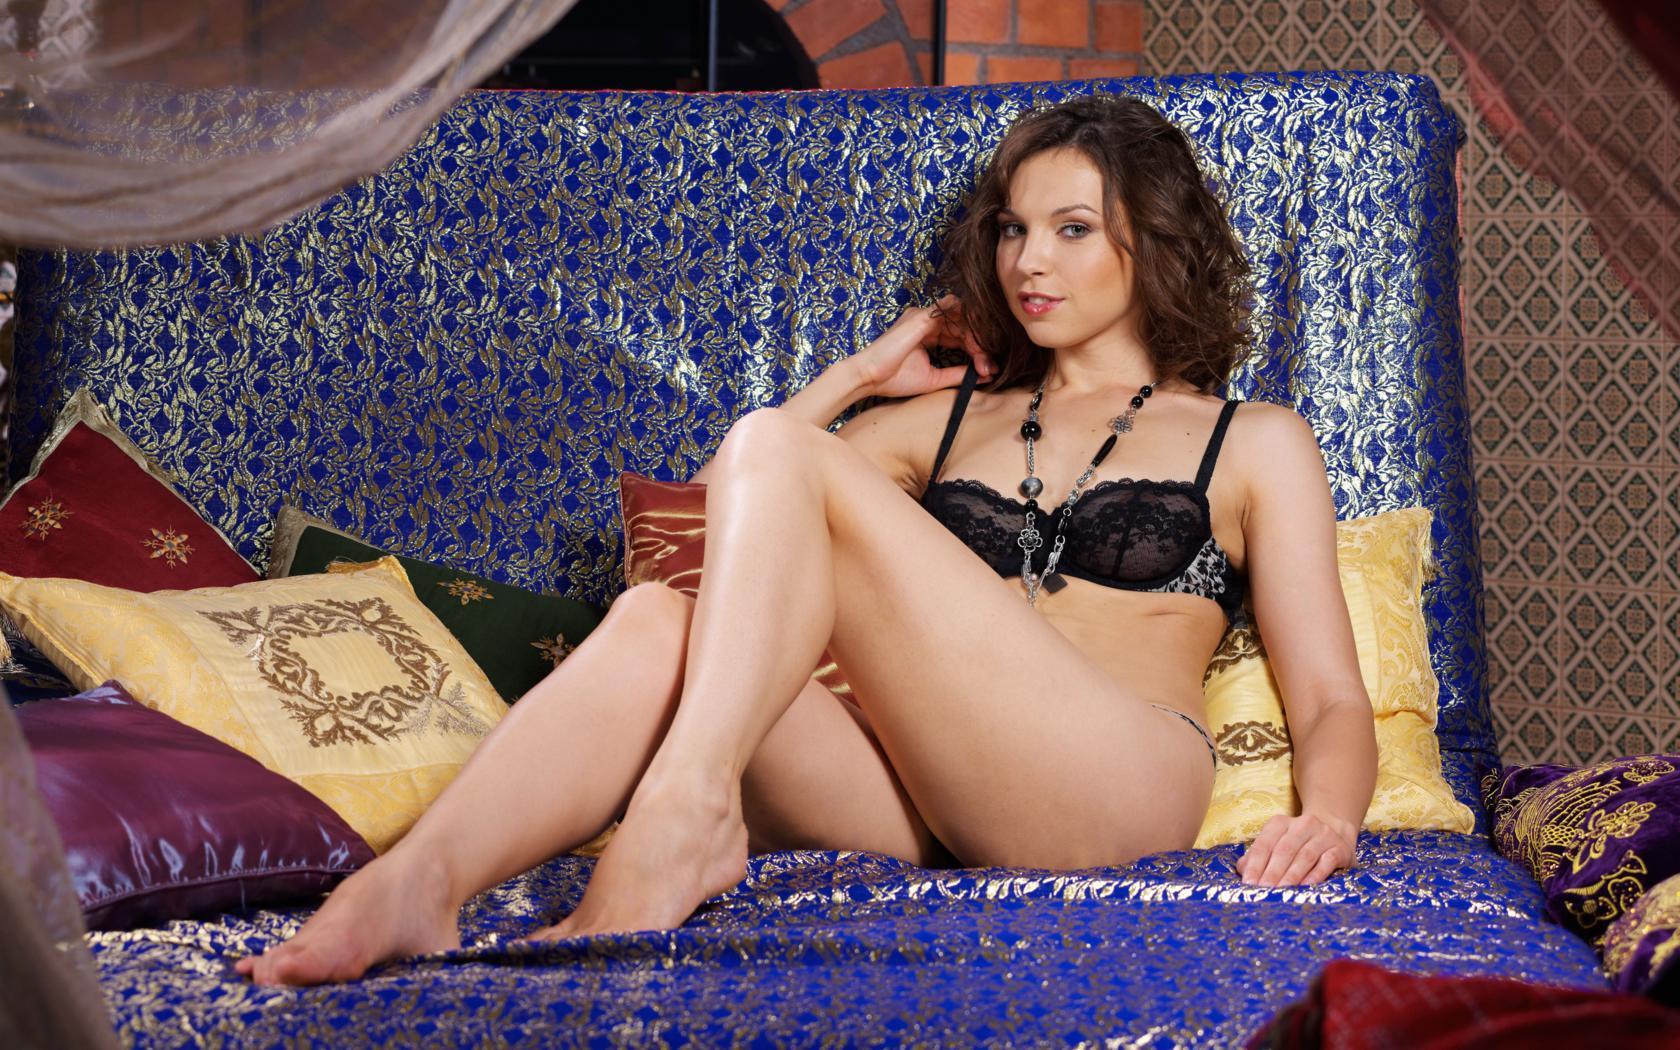 Download photo 1680x1050, anita e, brunette, sexy girl